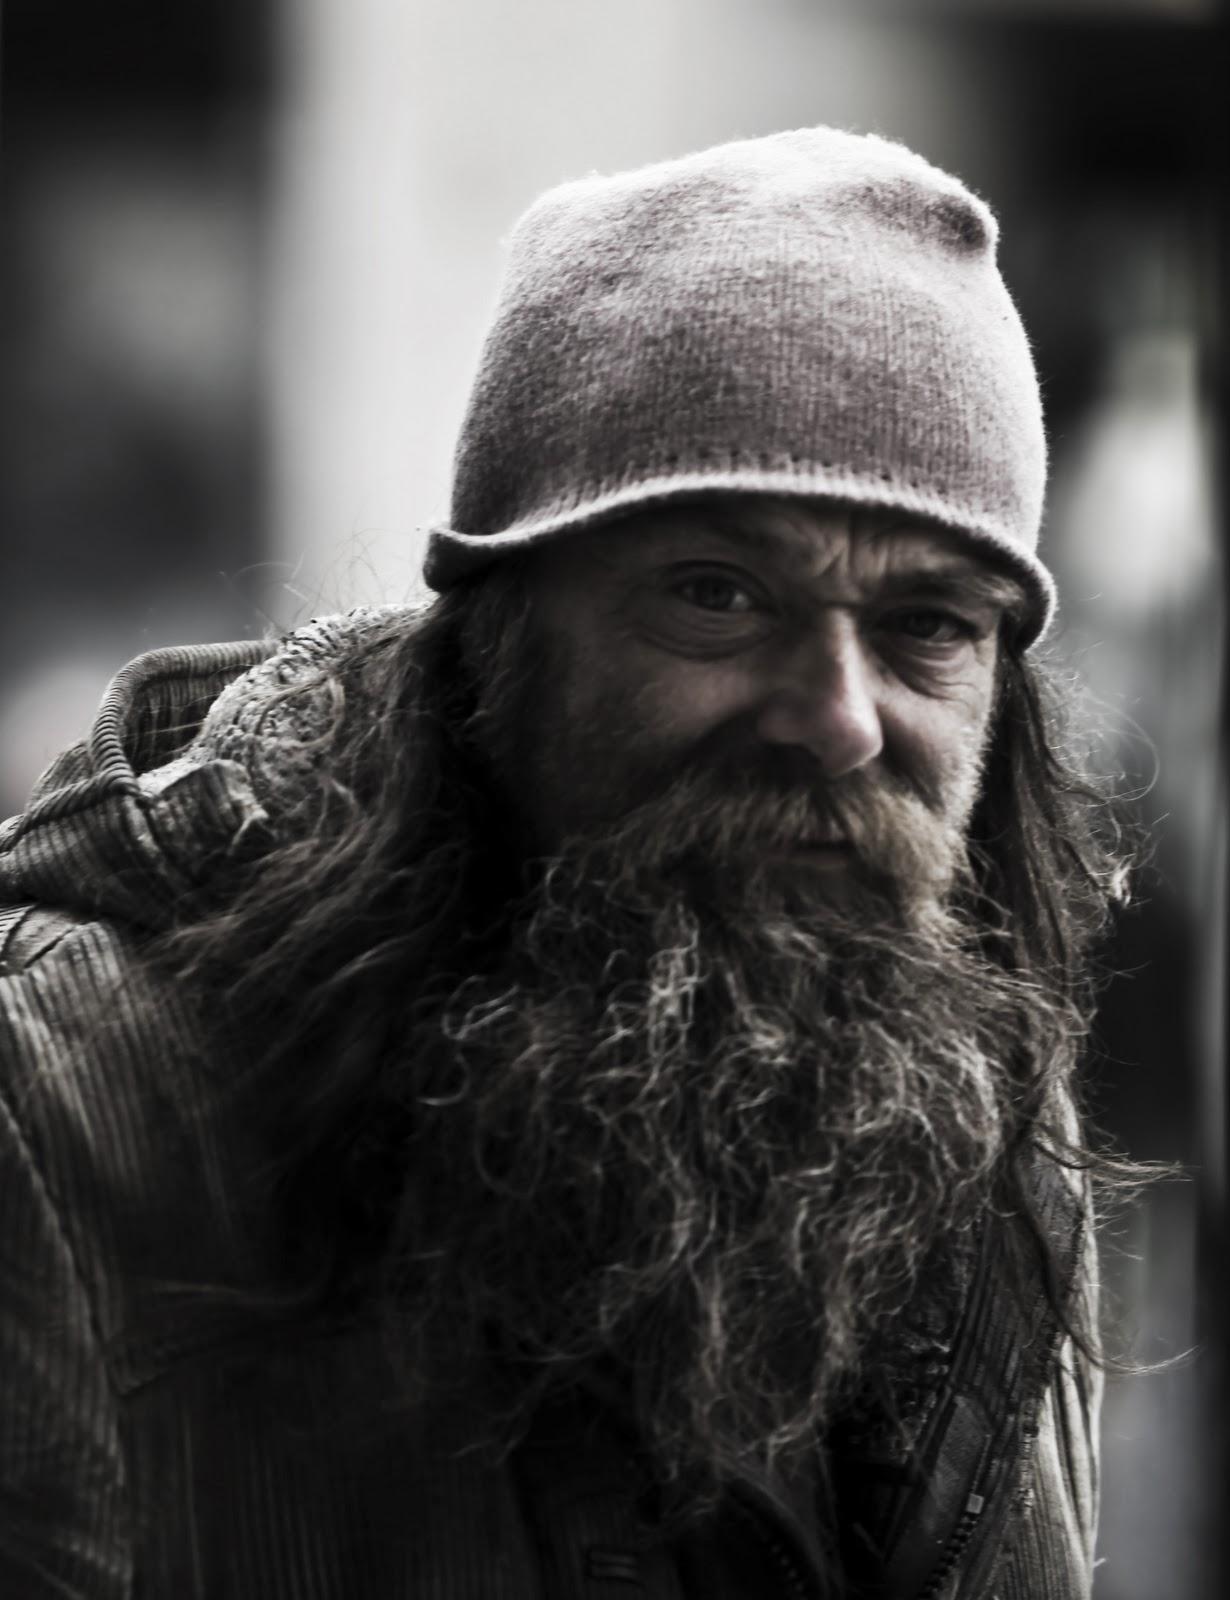 Newcastle Homeless Man Homeless Man Newcastle Crop